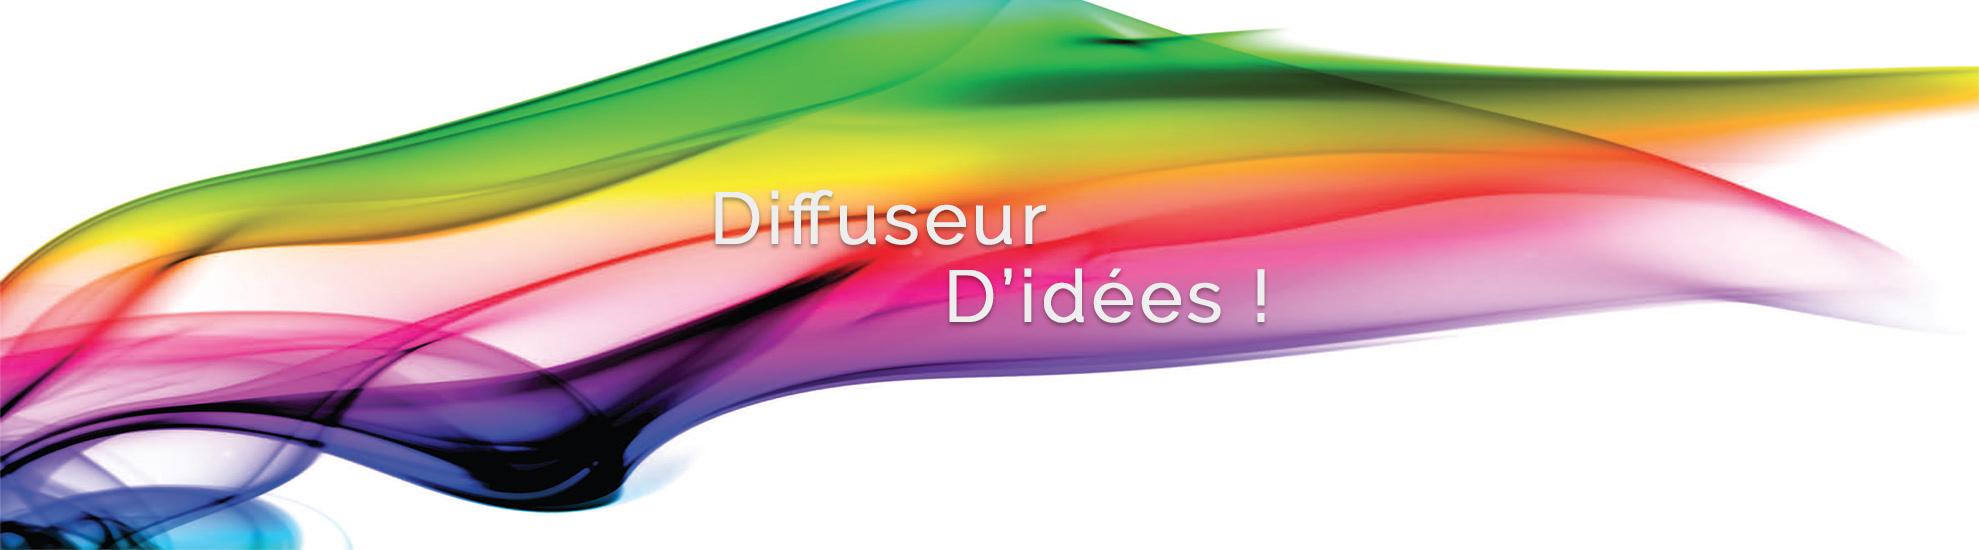 SLIDE Diffuseur